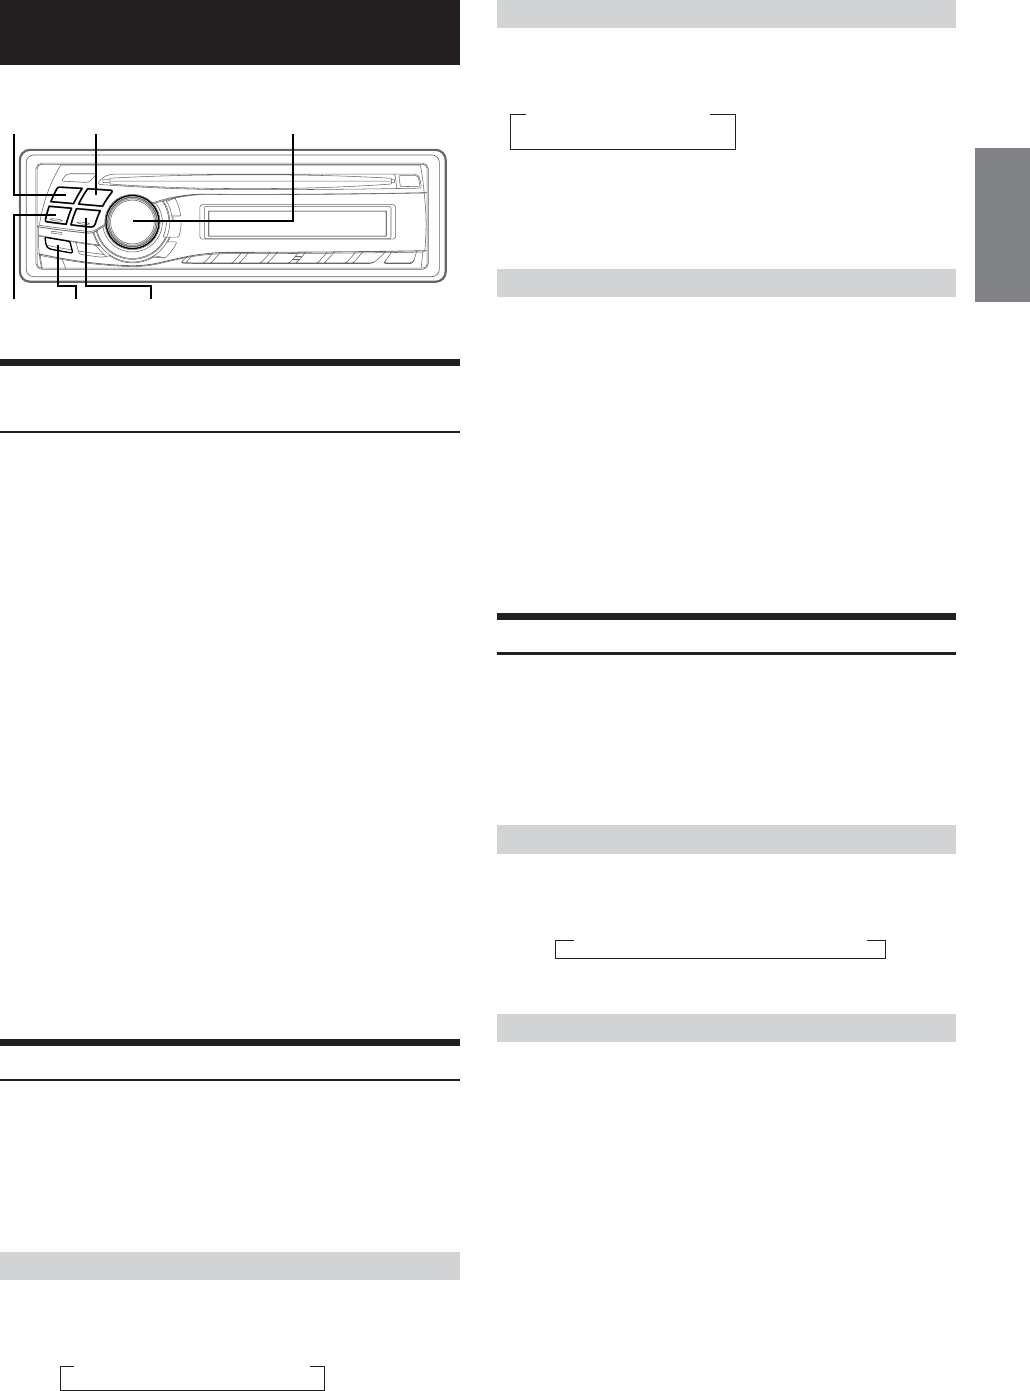 Alpine Cda 9847 Users Manual Ip Fuse Panelcar Wiring Diagram 13 En